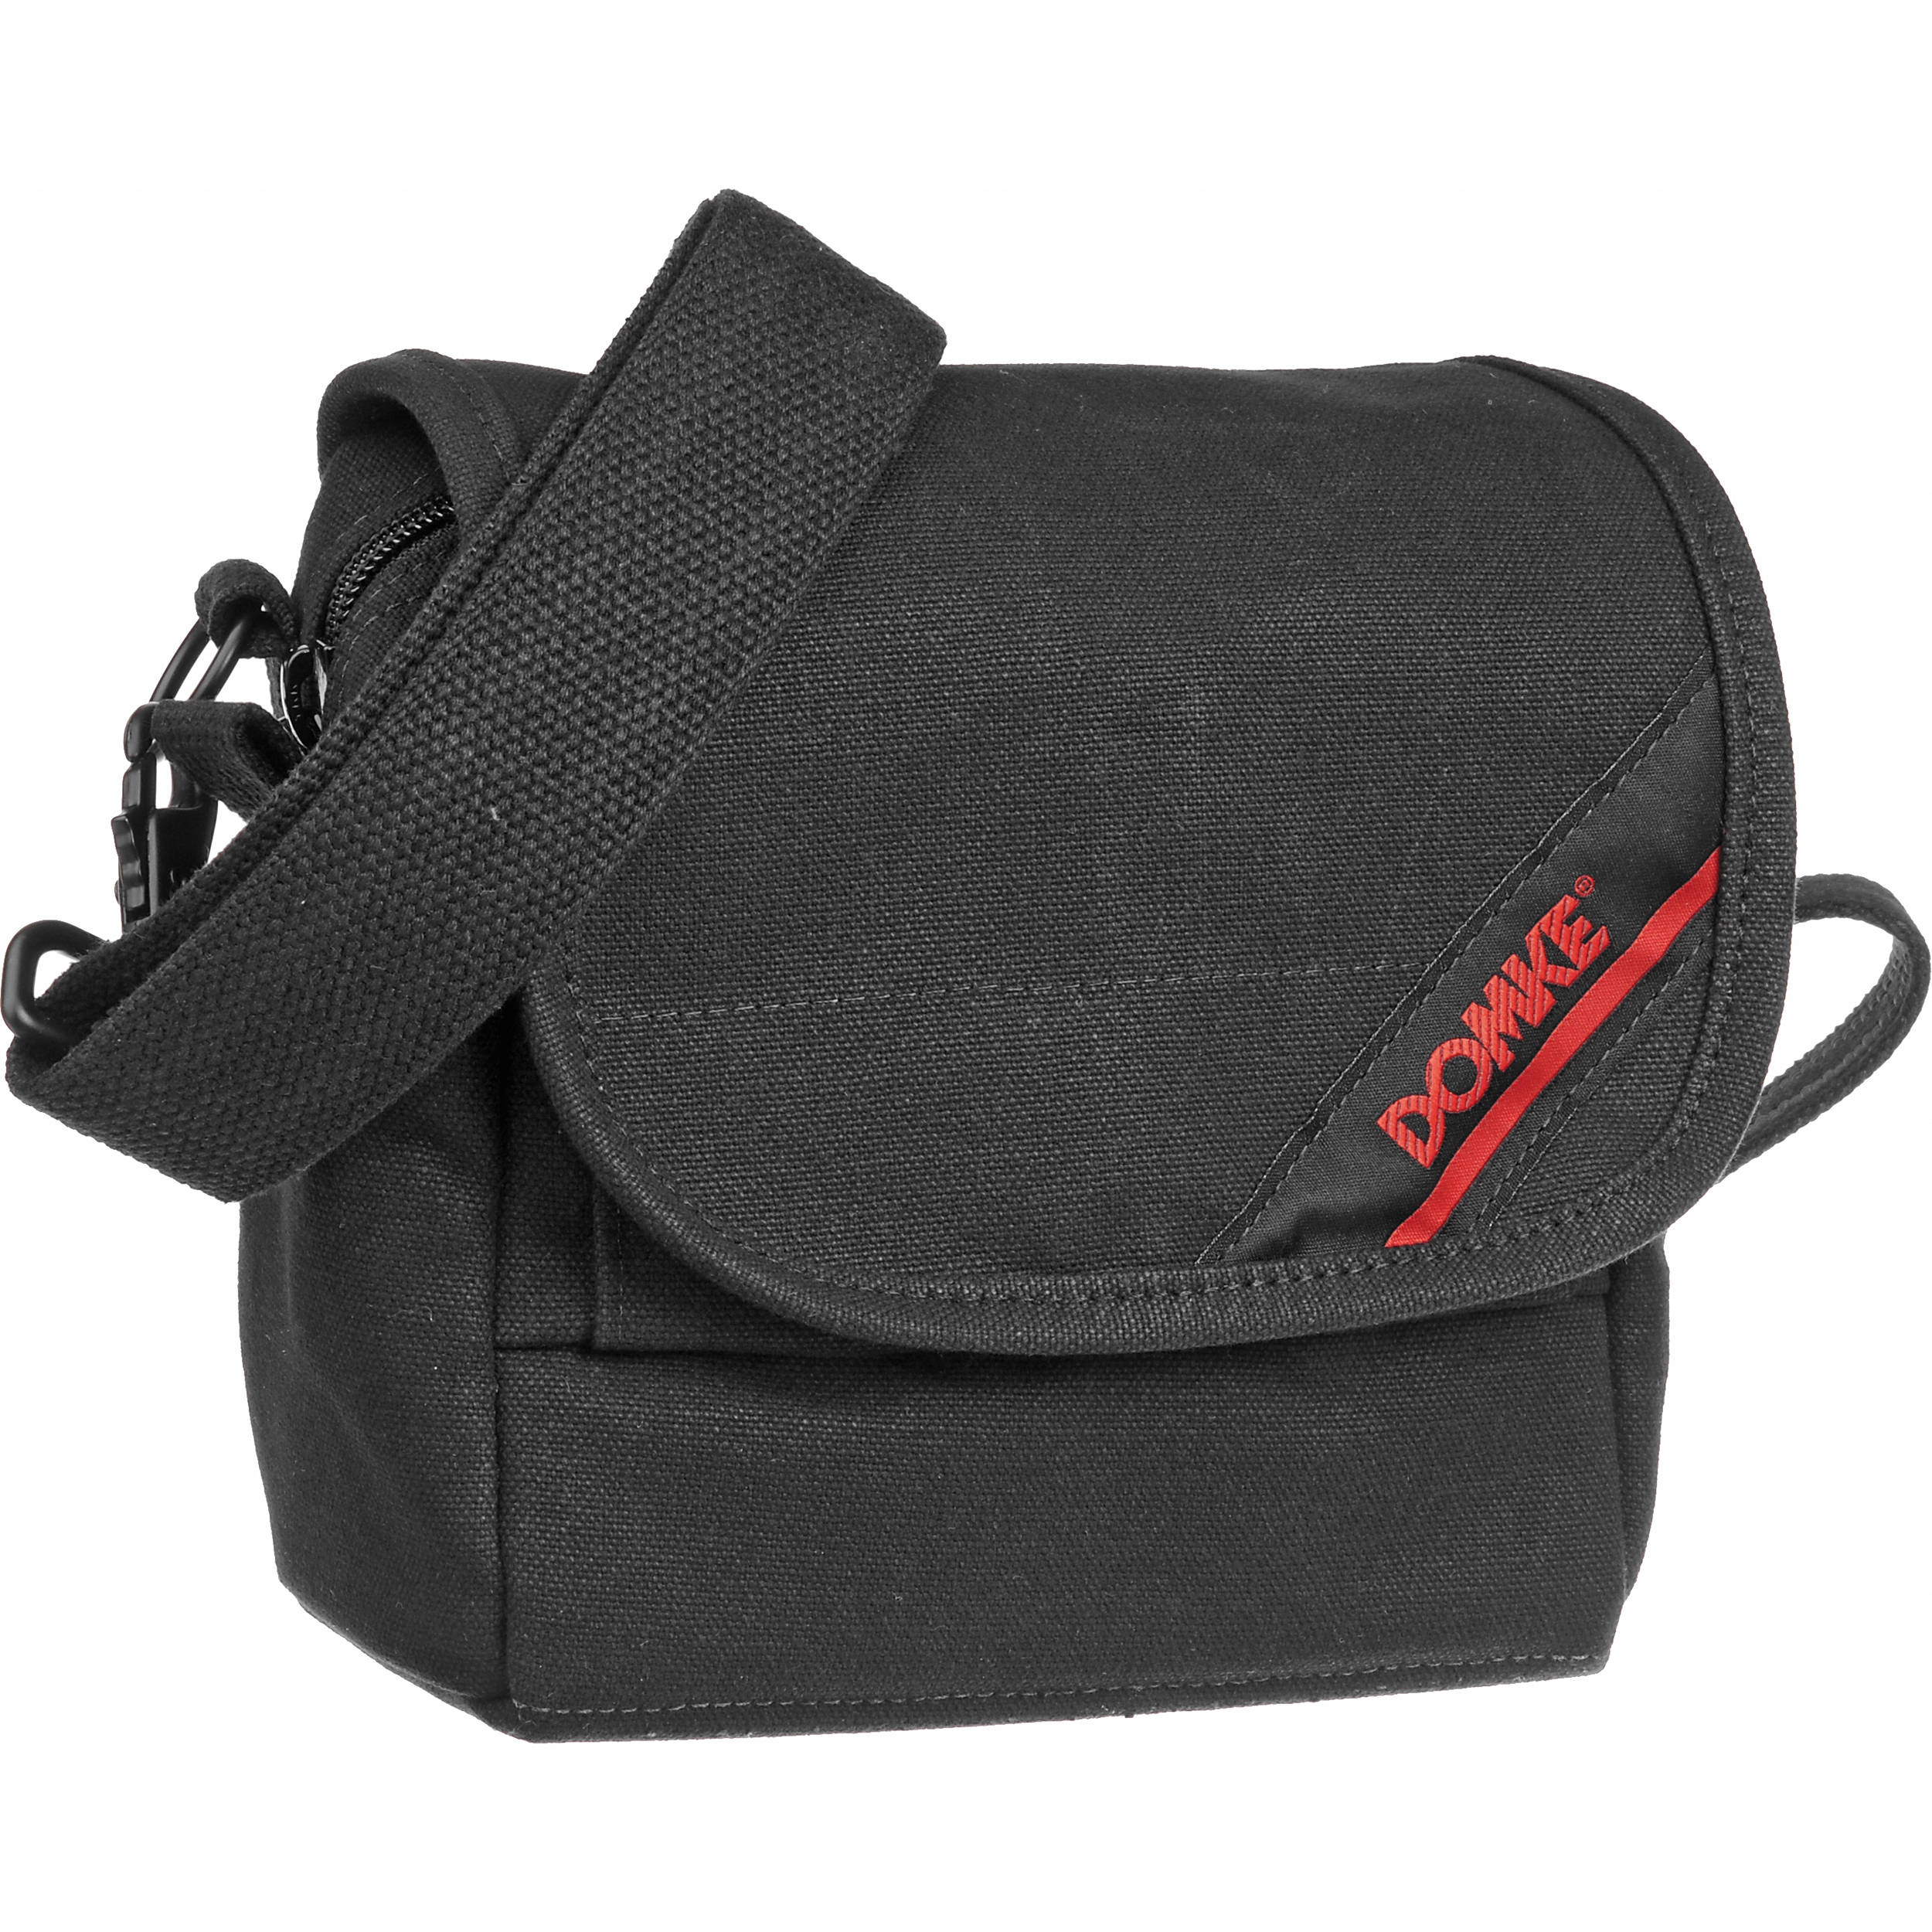 Domke F-5XA Shoulder and Belt Bag 428231072165b